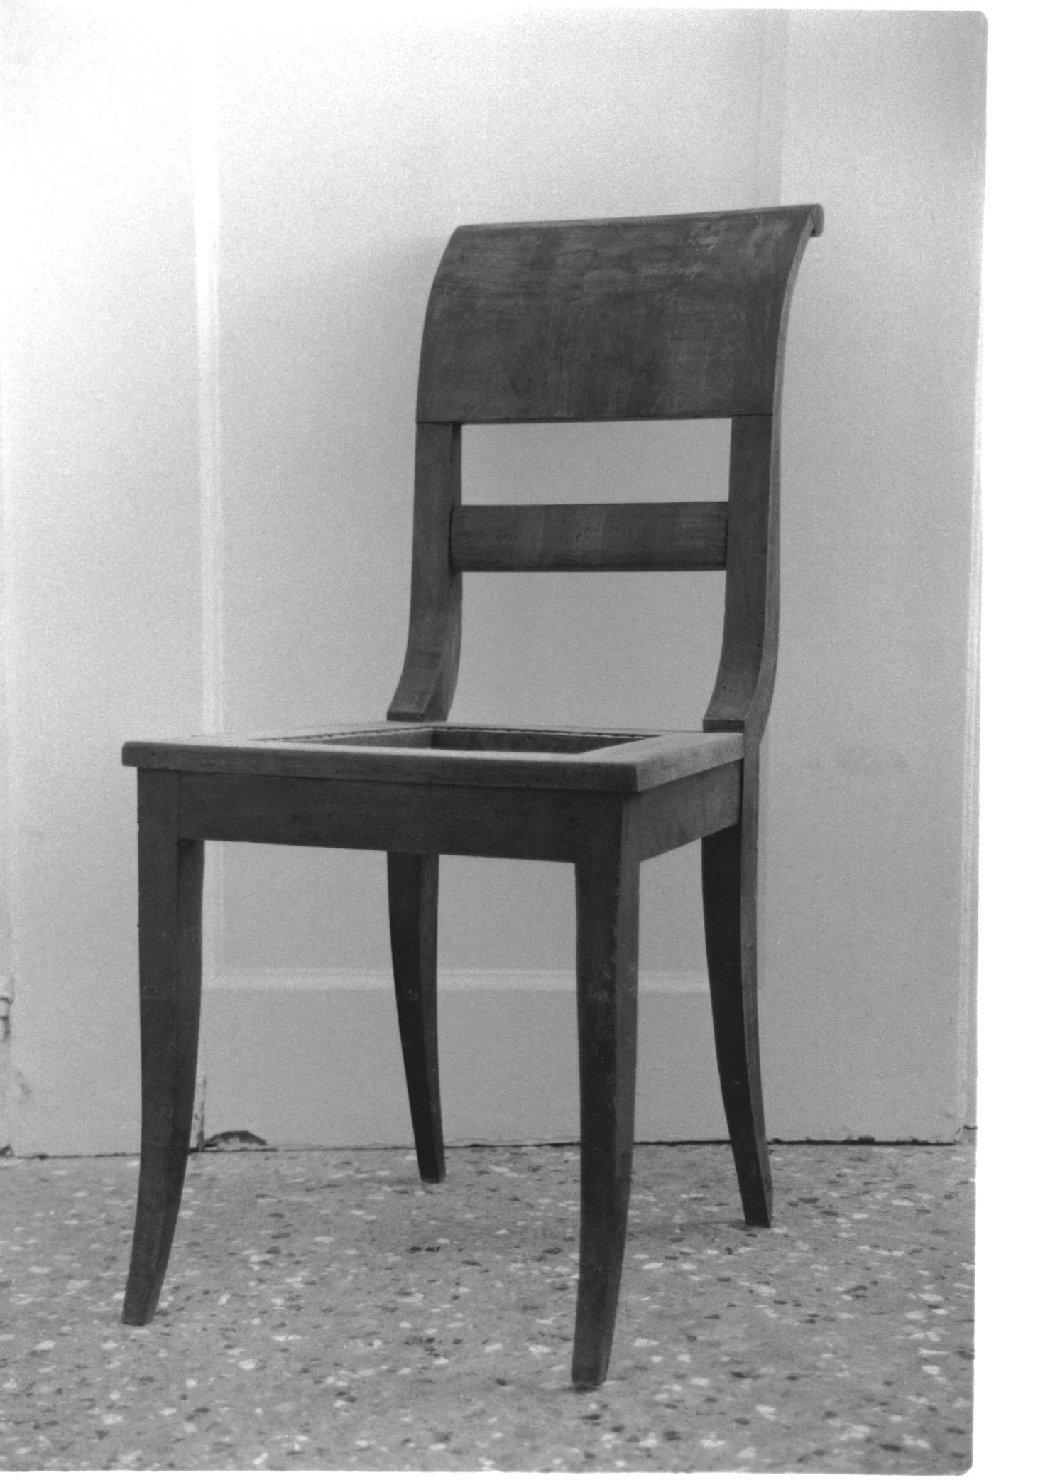 sedia, opera isolata - manifattura lombardo-veneta (sec. XIX)